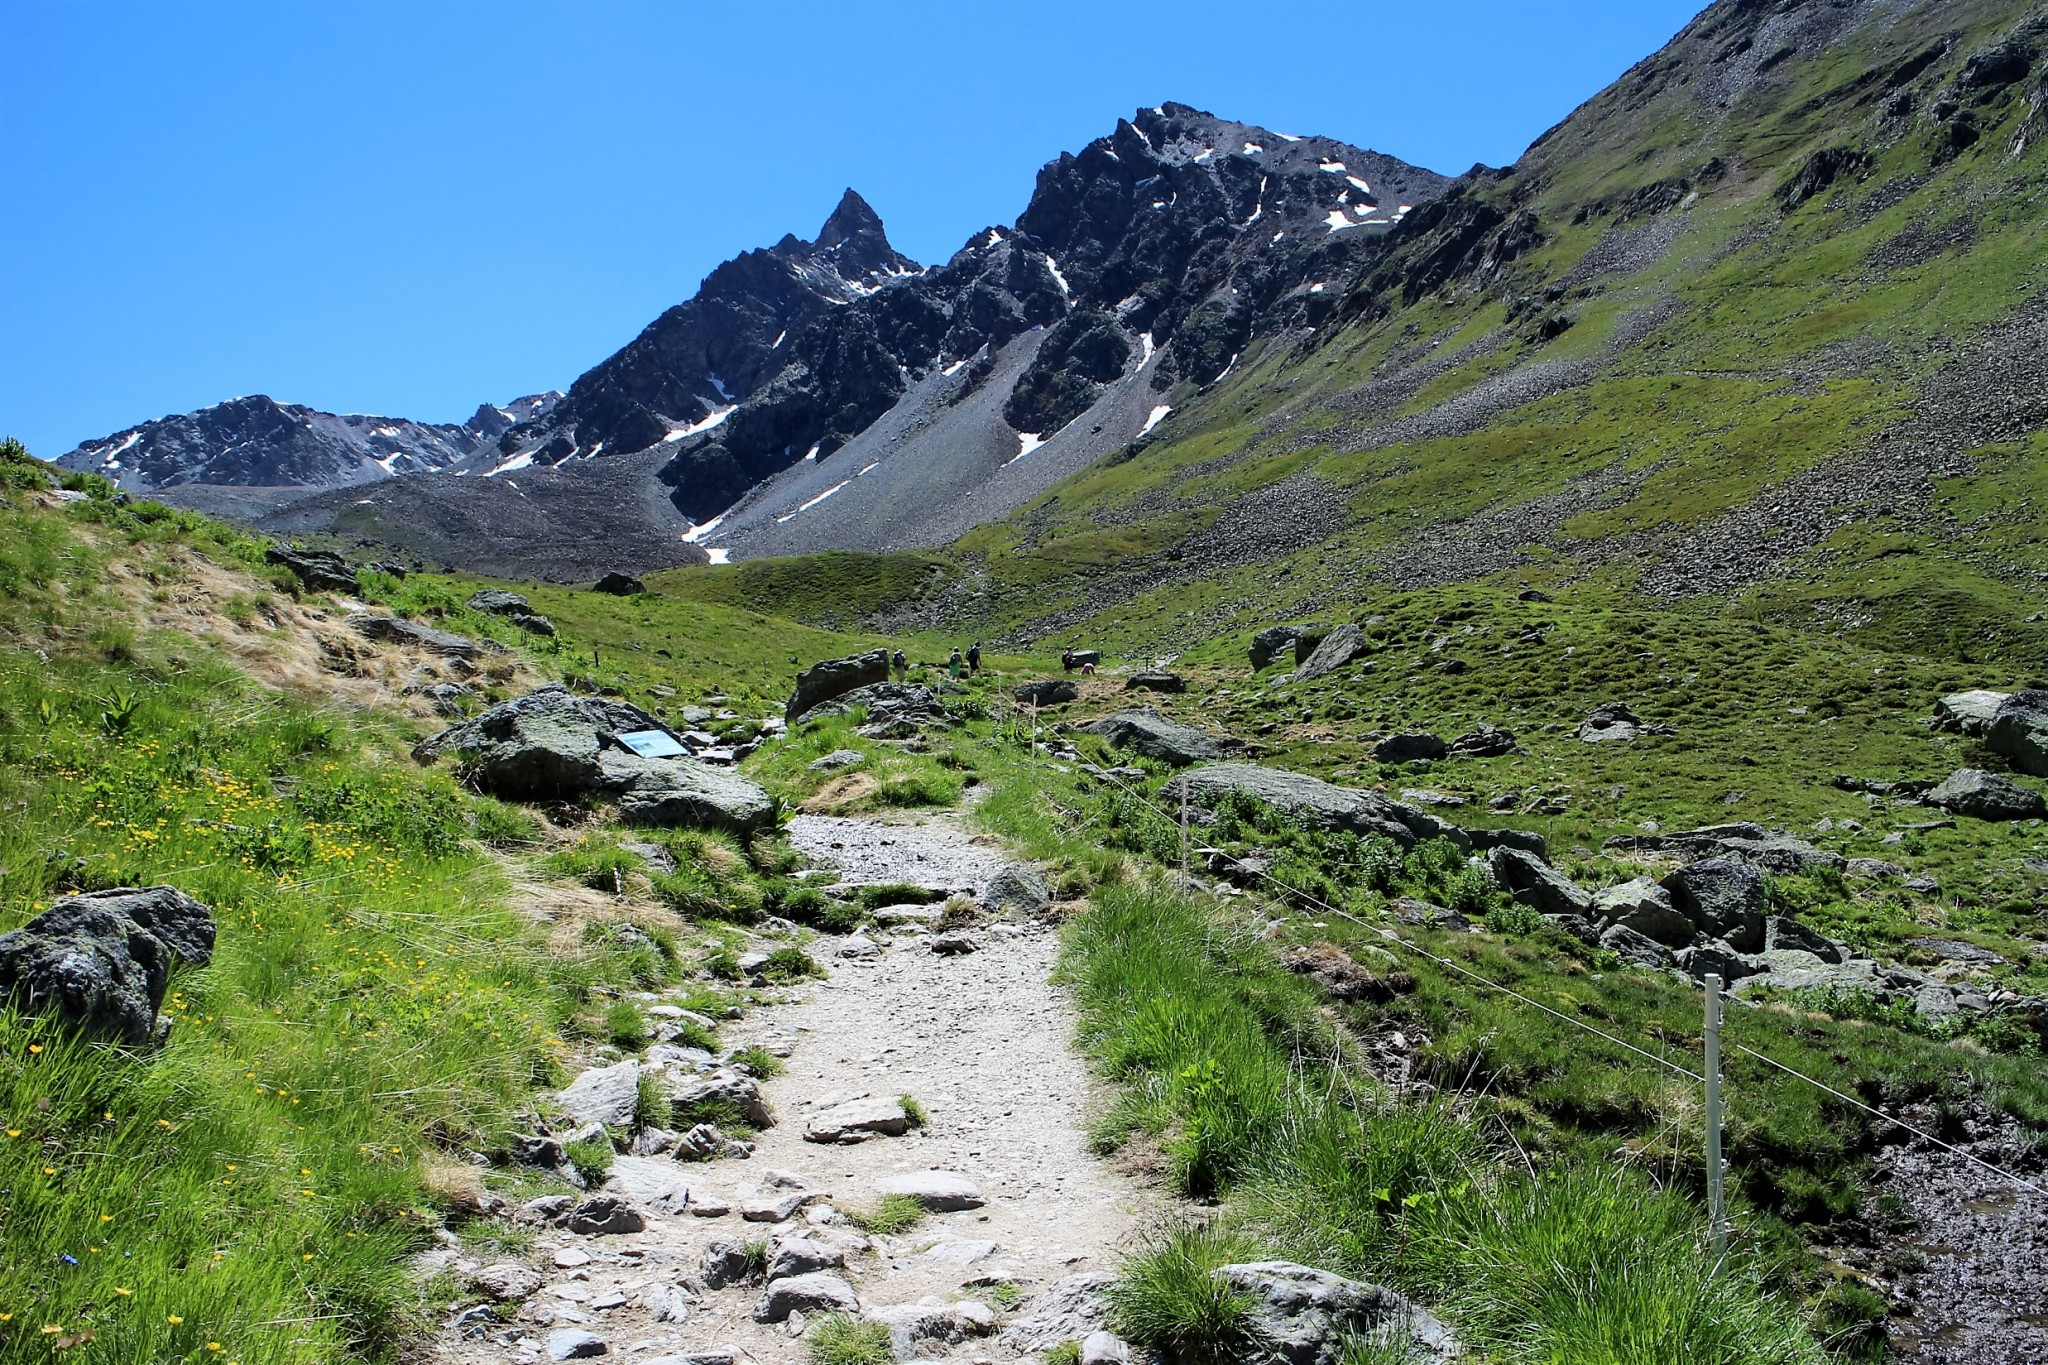 Muottas Muragl hiking